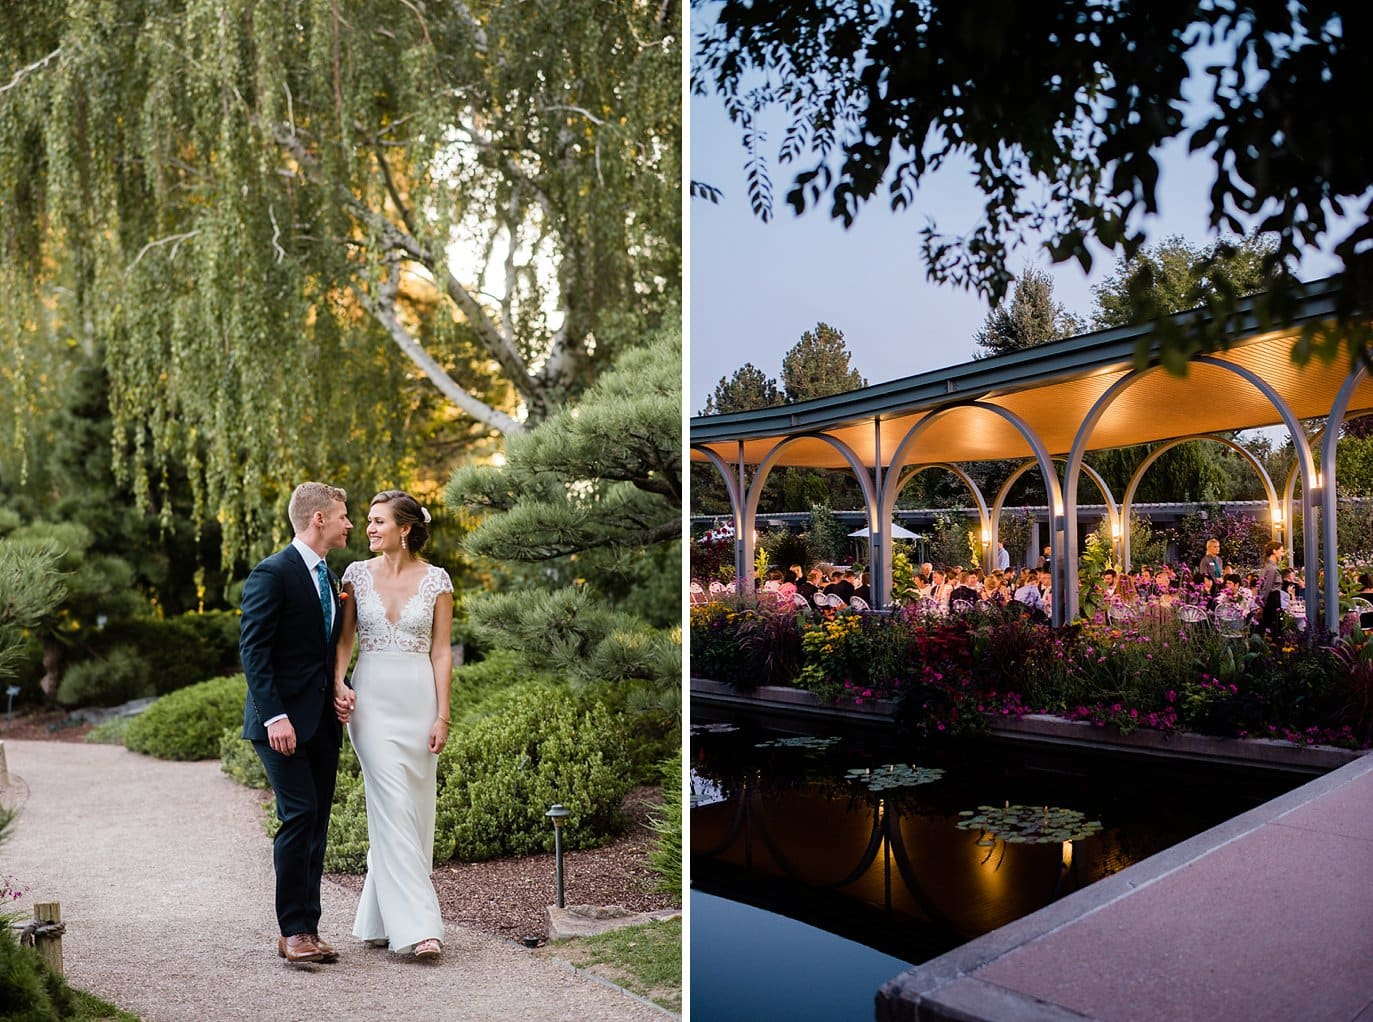 the Annuals Pavilion twilight al fresco dinner at Denver Botanic Gardens wedding by Denver Wedding Photographer Jennie Crate